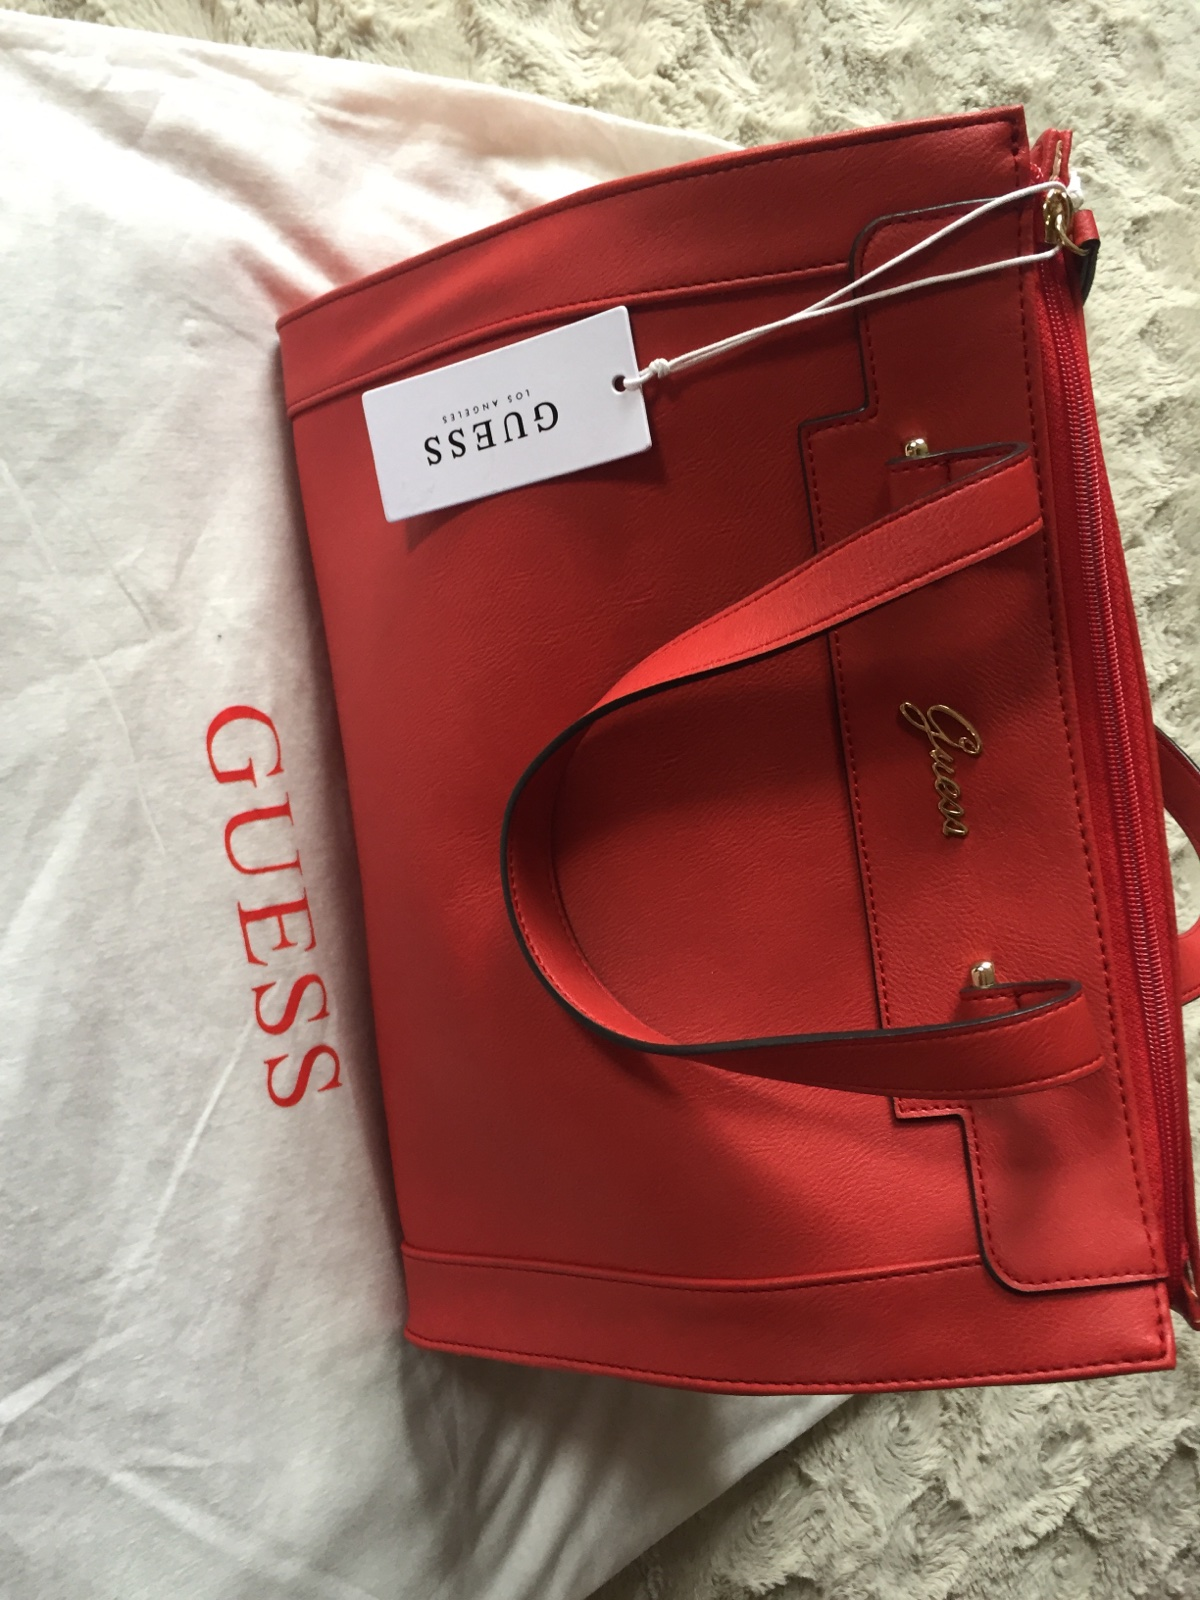 Guess kabelka original -nová a8353f64829